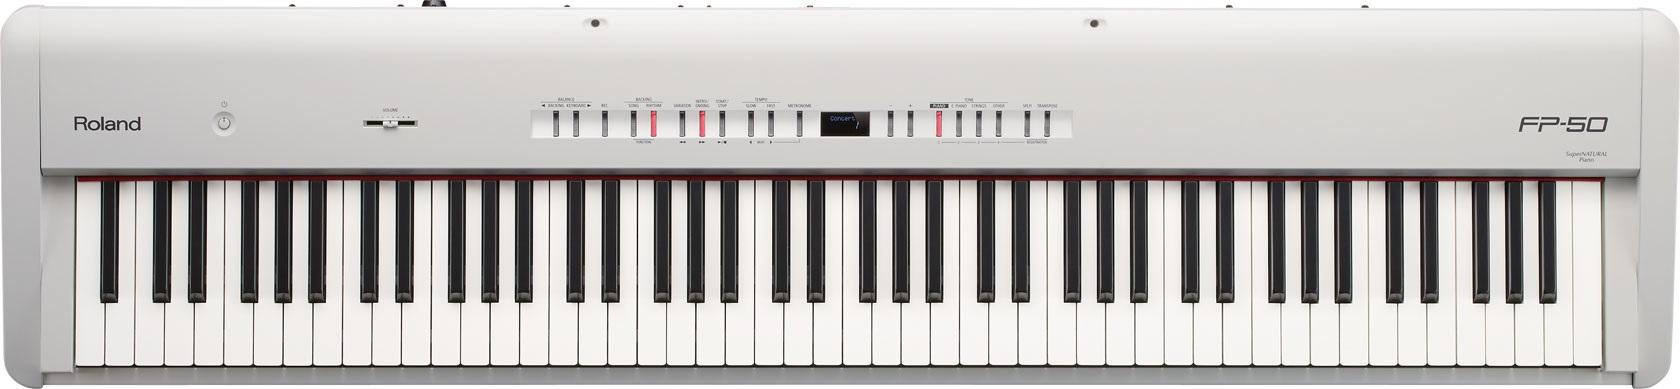 Roland FP-50 WT